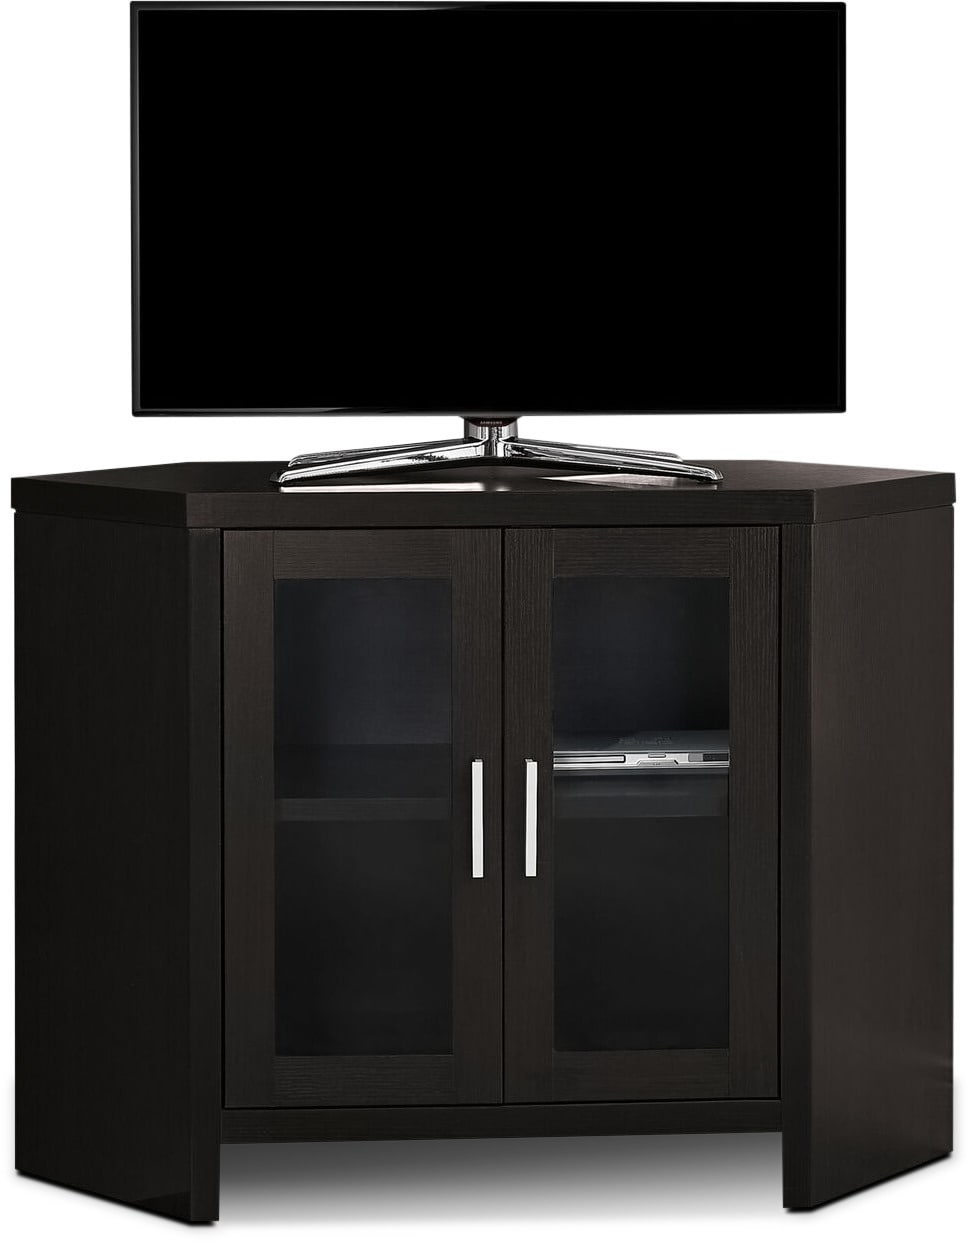 Entertainment Furniture - Sebastian TV Stand - Cappuccino